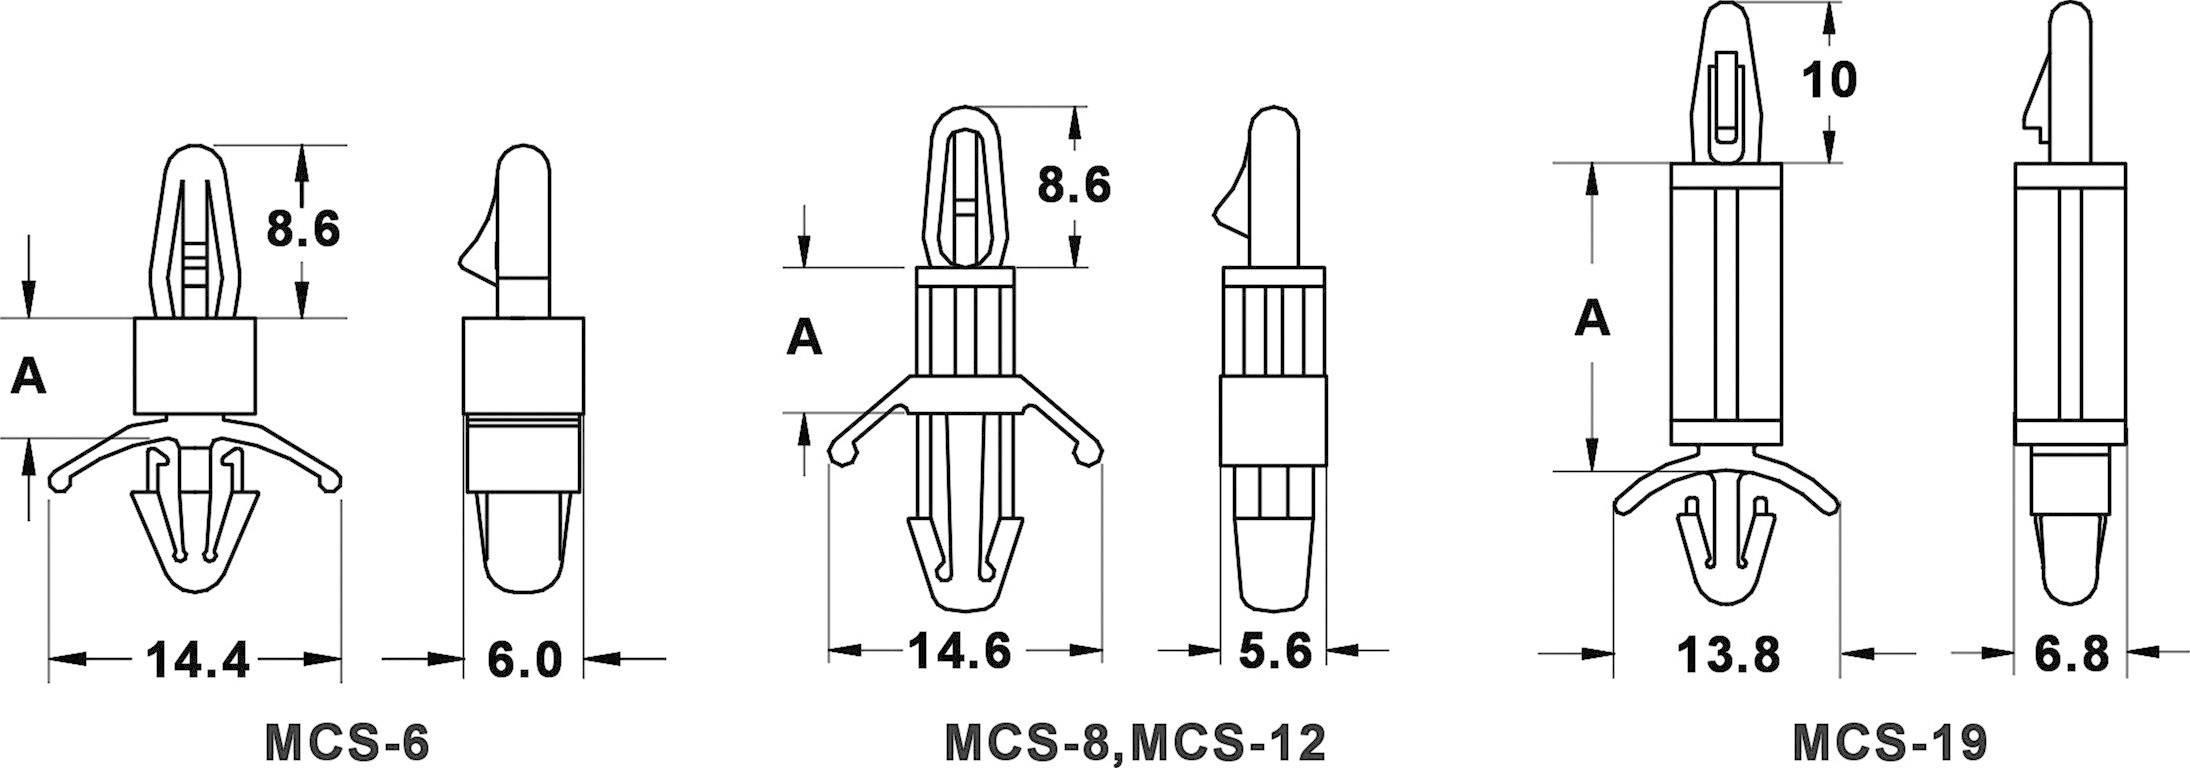 Držiak na DPS KSS MCS8 534187, polyamid, délka 7.8 mm, 1 ks